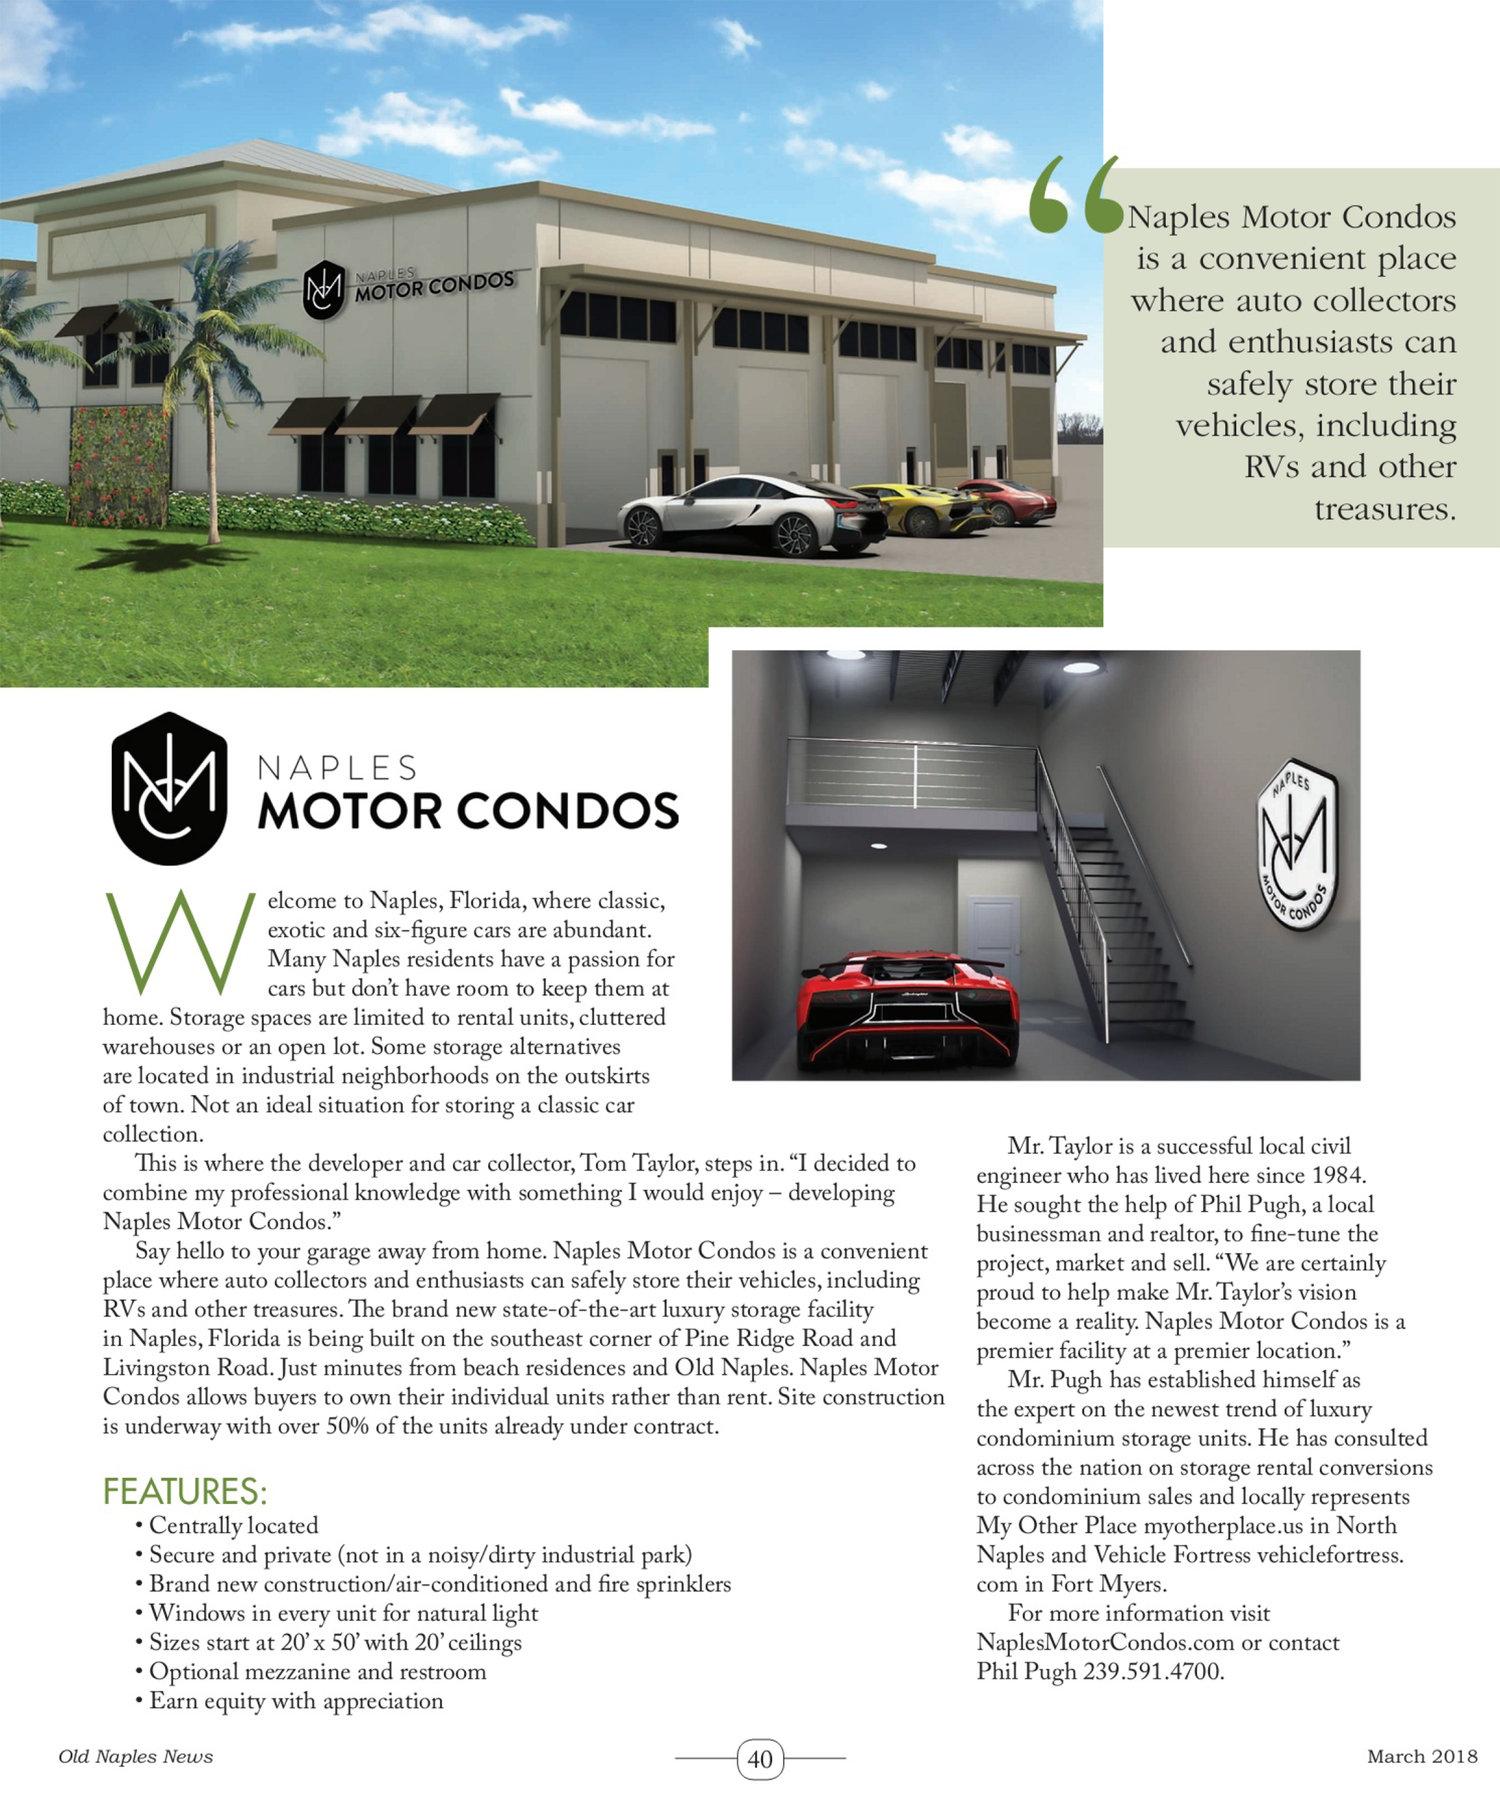 Old Naples News Magazine — Naples Motor Condos